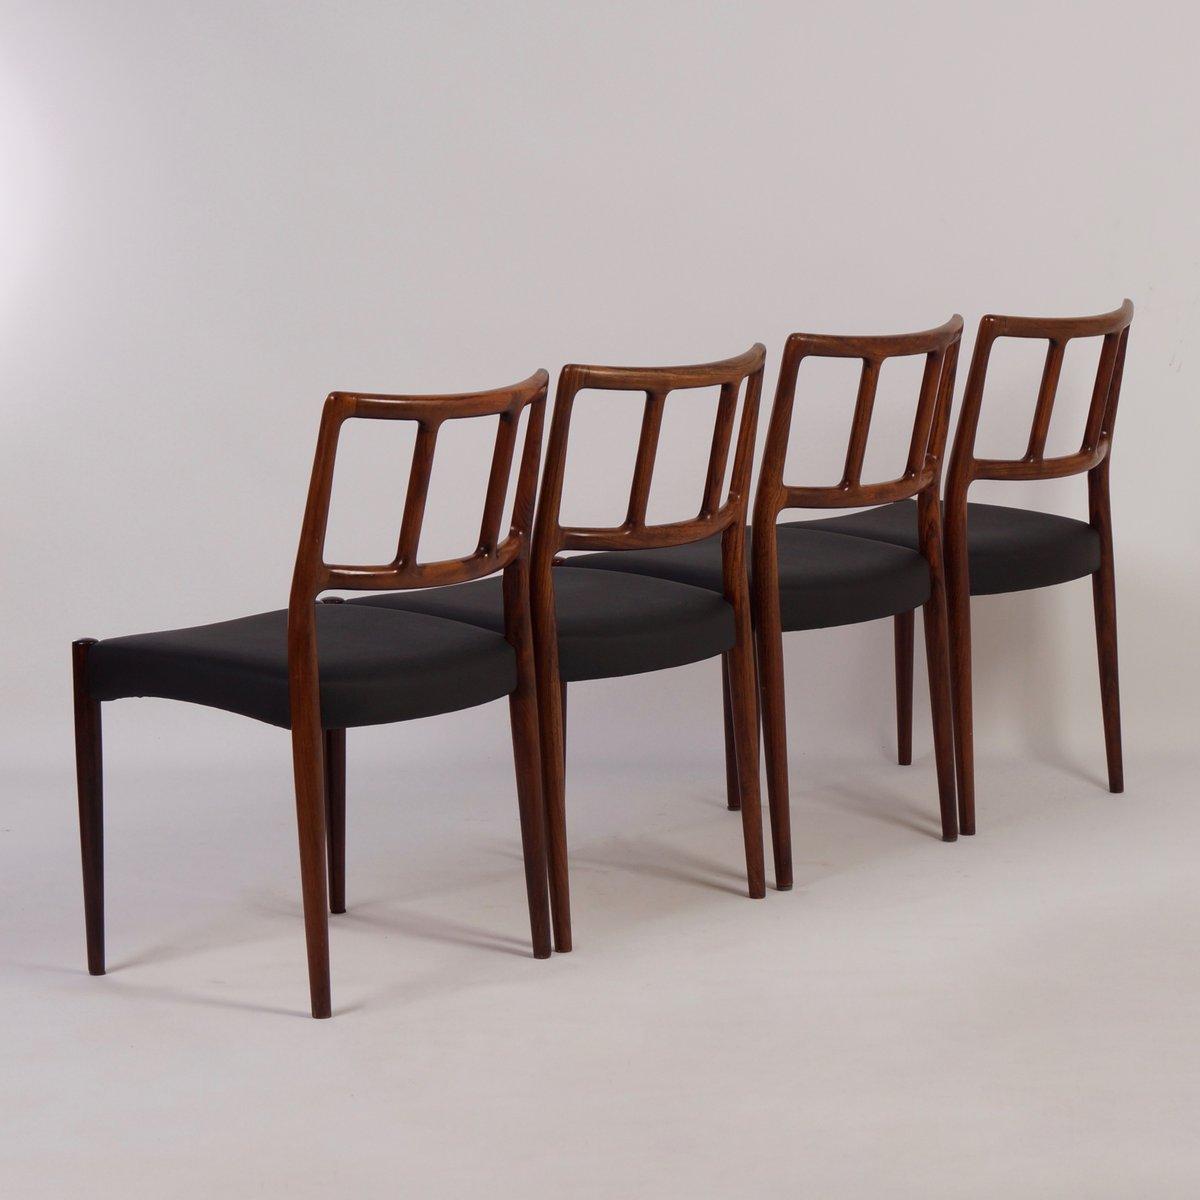 Danish Dining Chair danish dining chairsjohannes andersen for uldum møbelfabrik